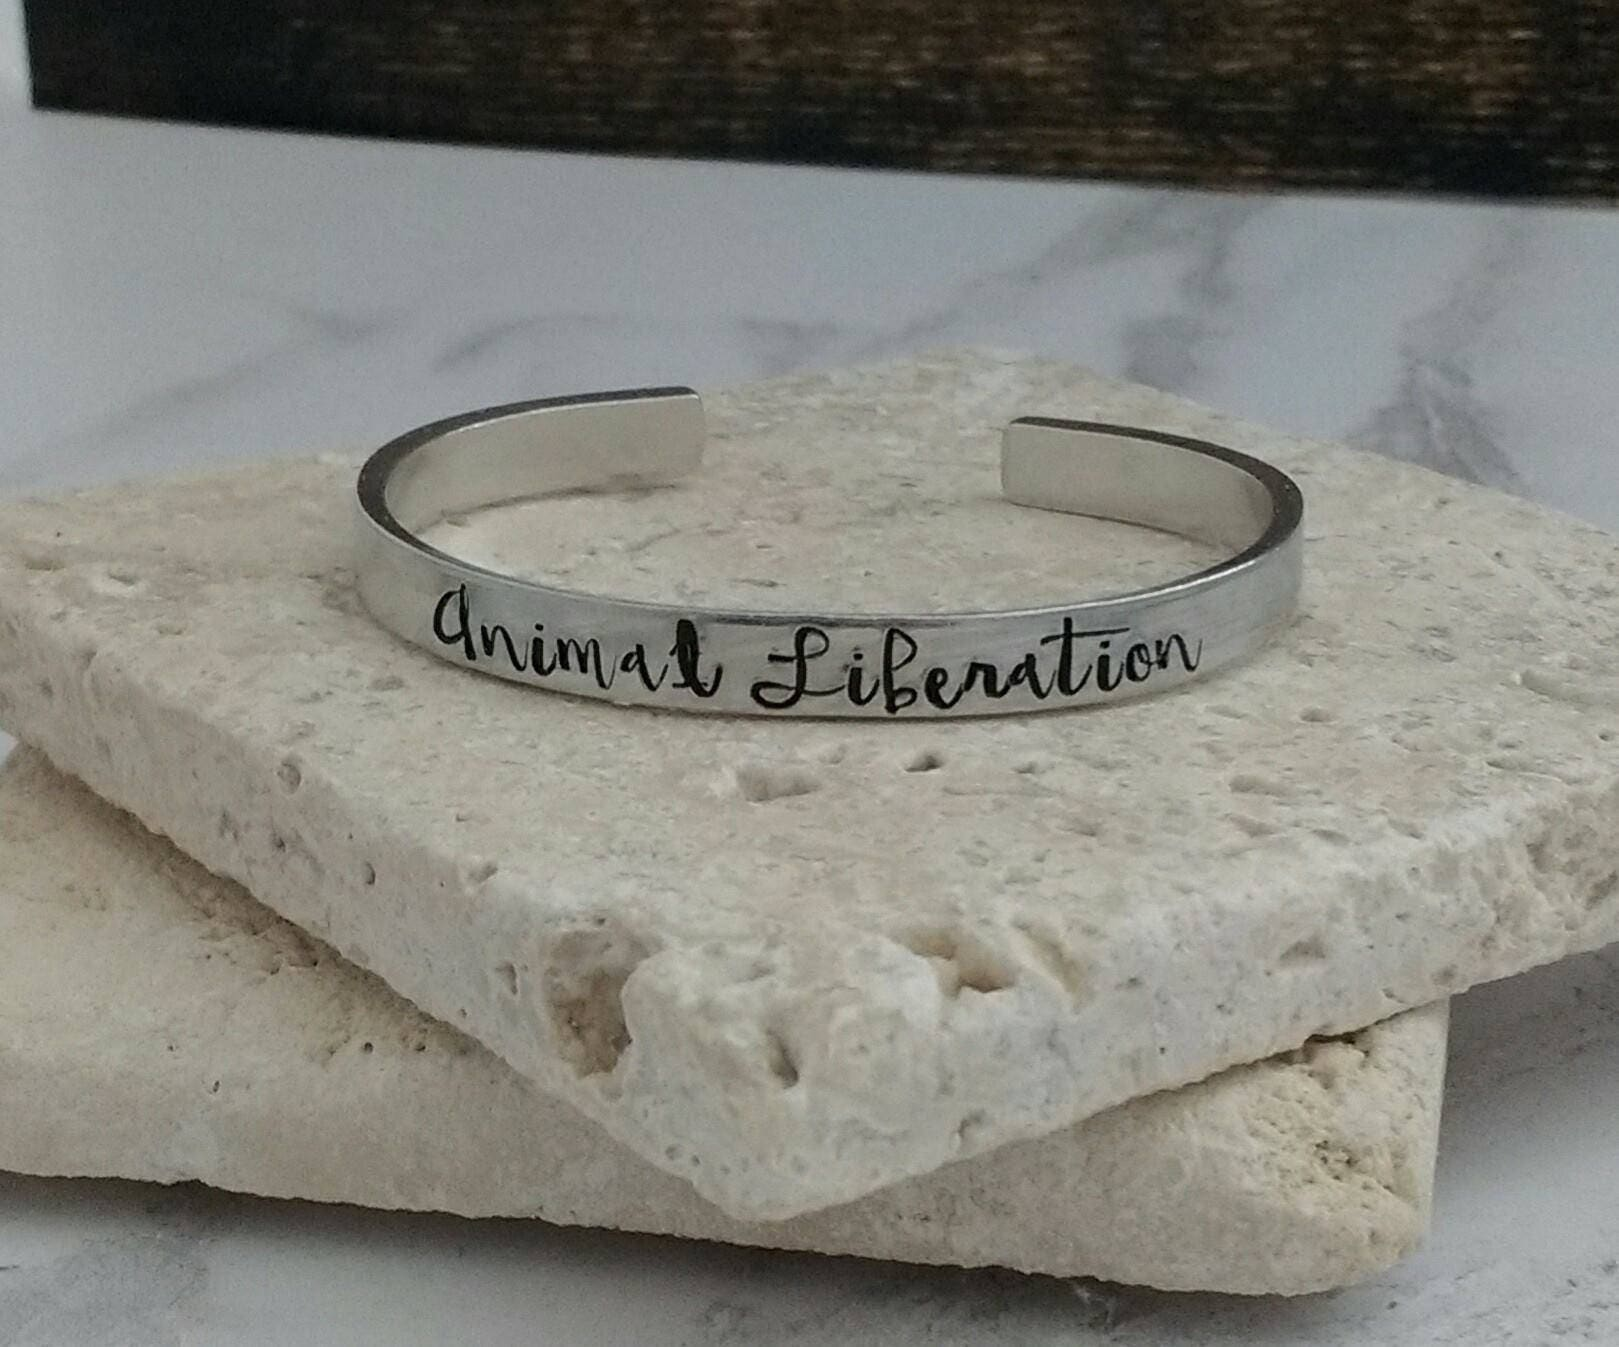 Animal liberation vegan bracelet - adjustable - handstamped - aluminium, copper, brass or sterling silver